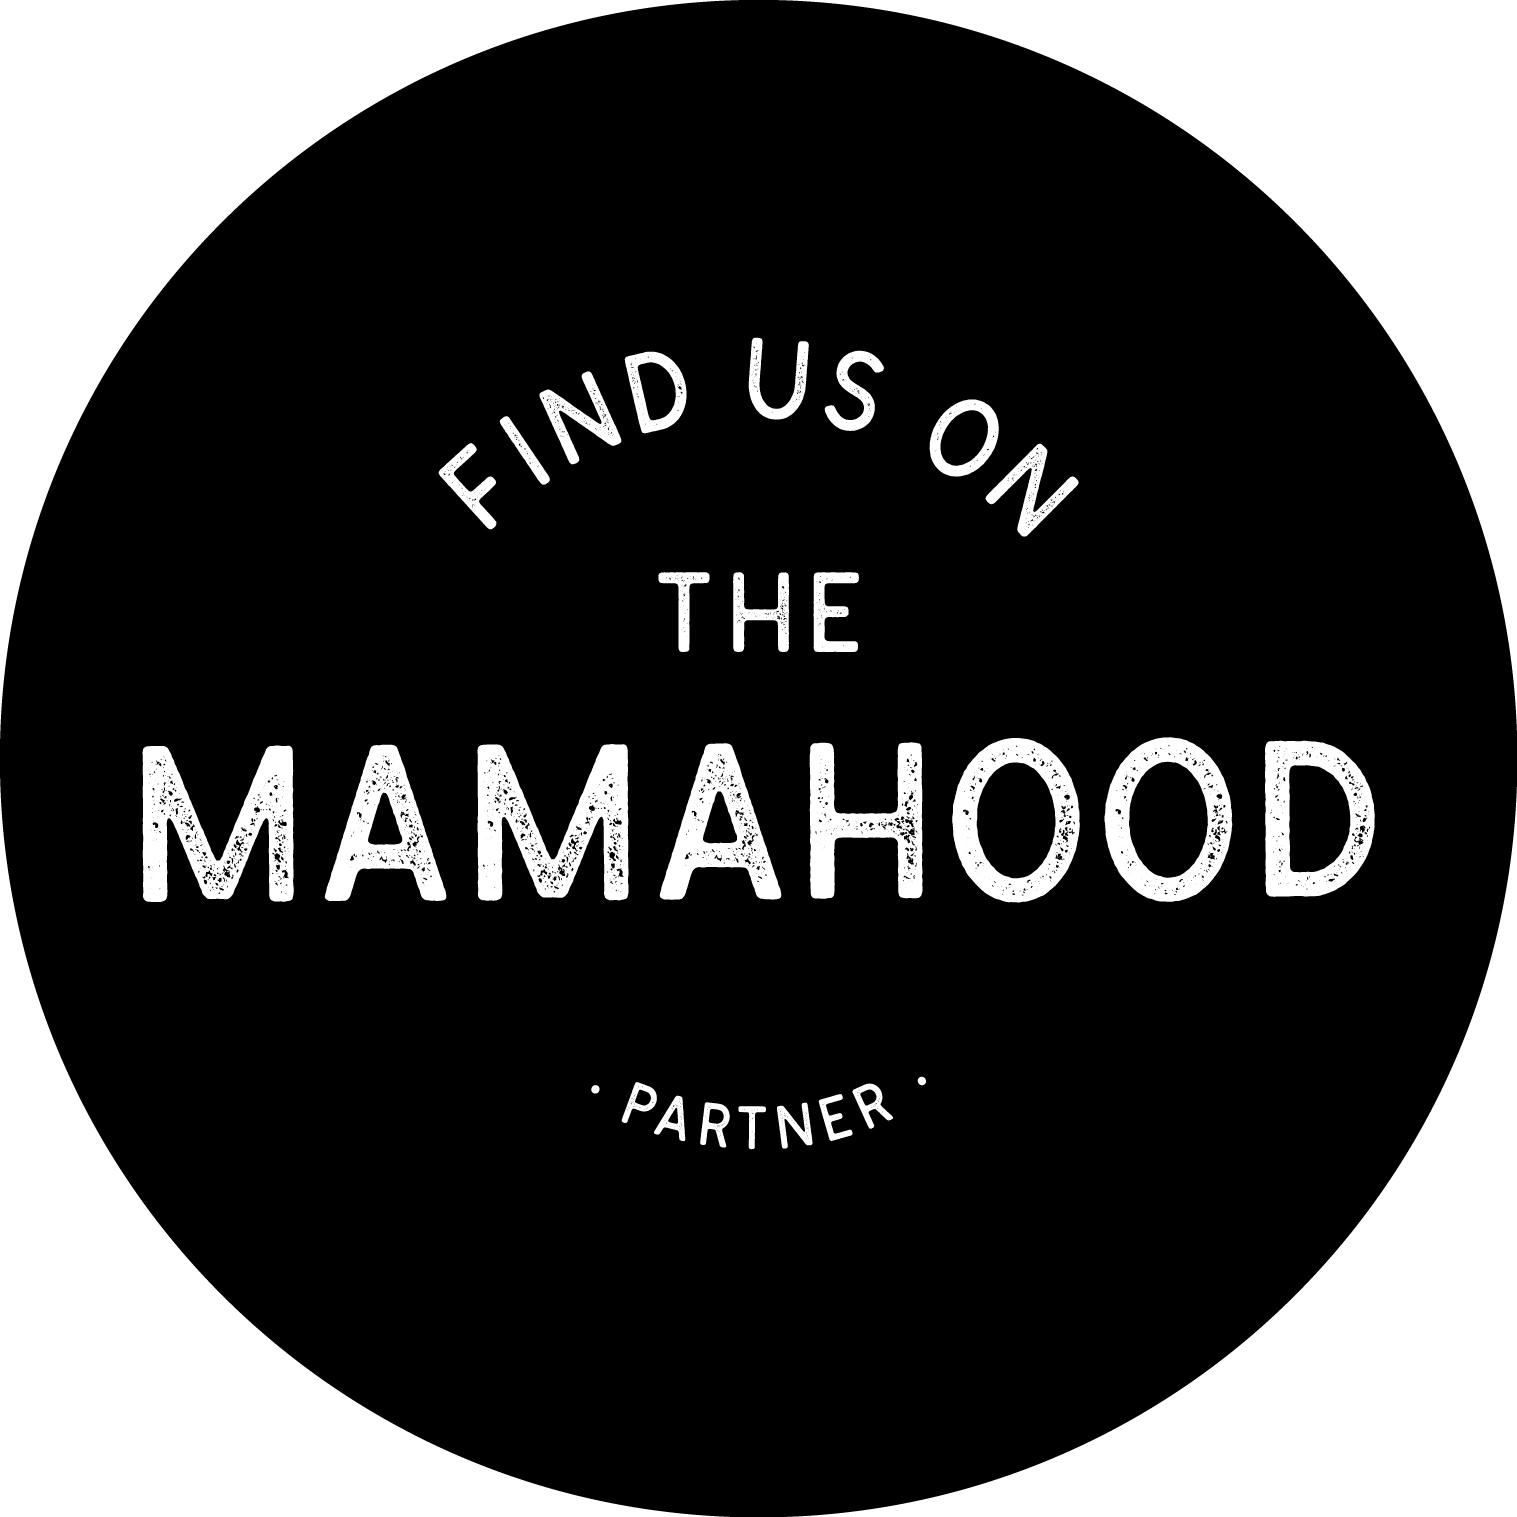 The Mamahood